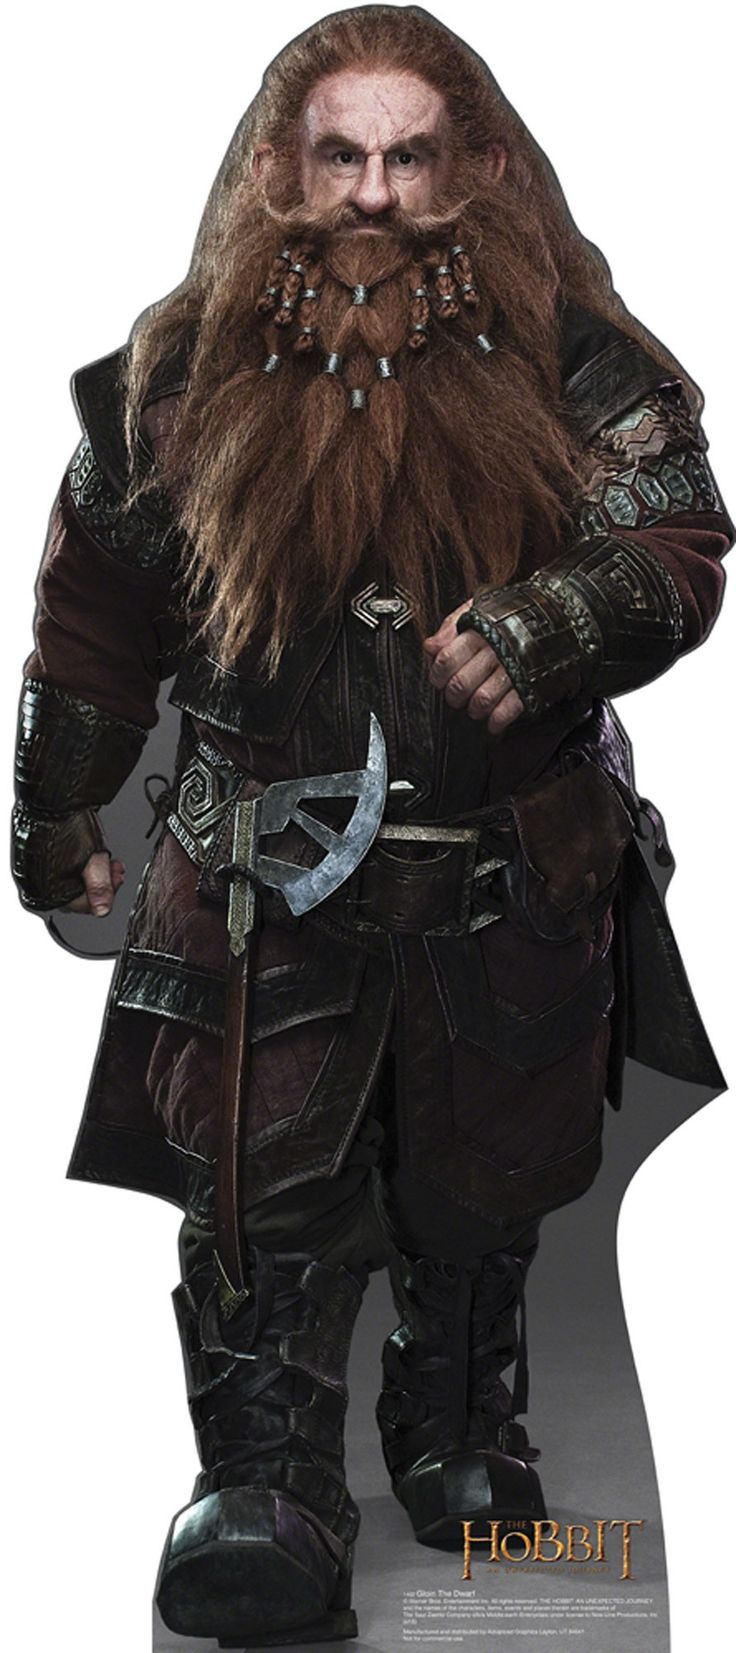 Hobbit gmail theme - Gloin The Dwarf The Hobbit Cardboard Standup